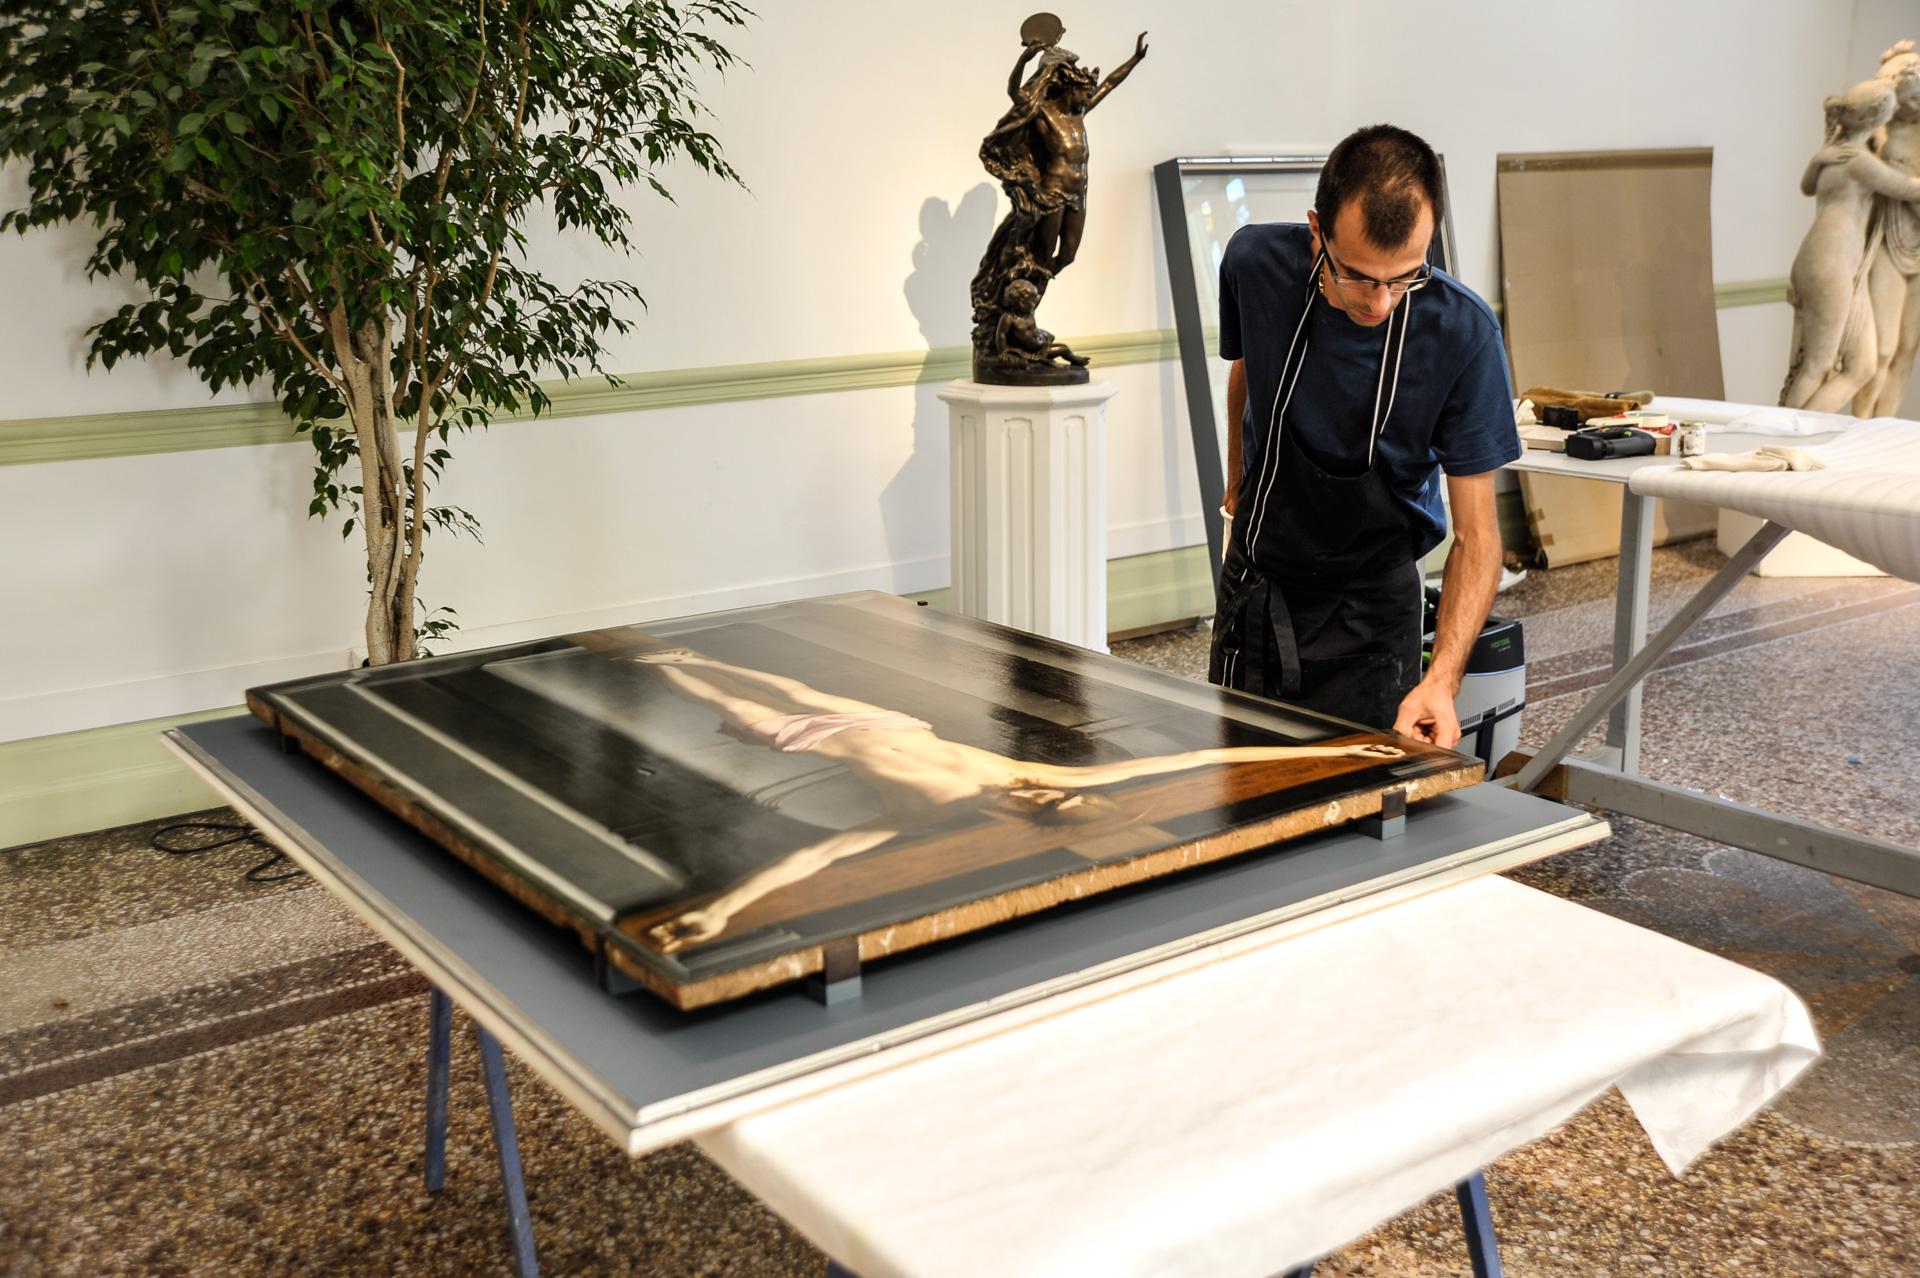 005-AtelierTournillon-Crucifixion-Bronzino